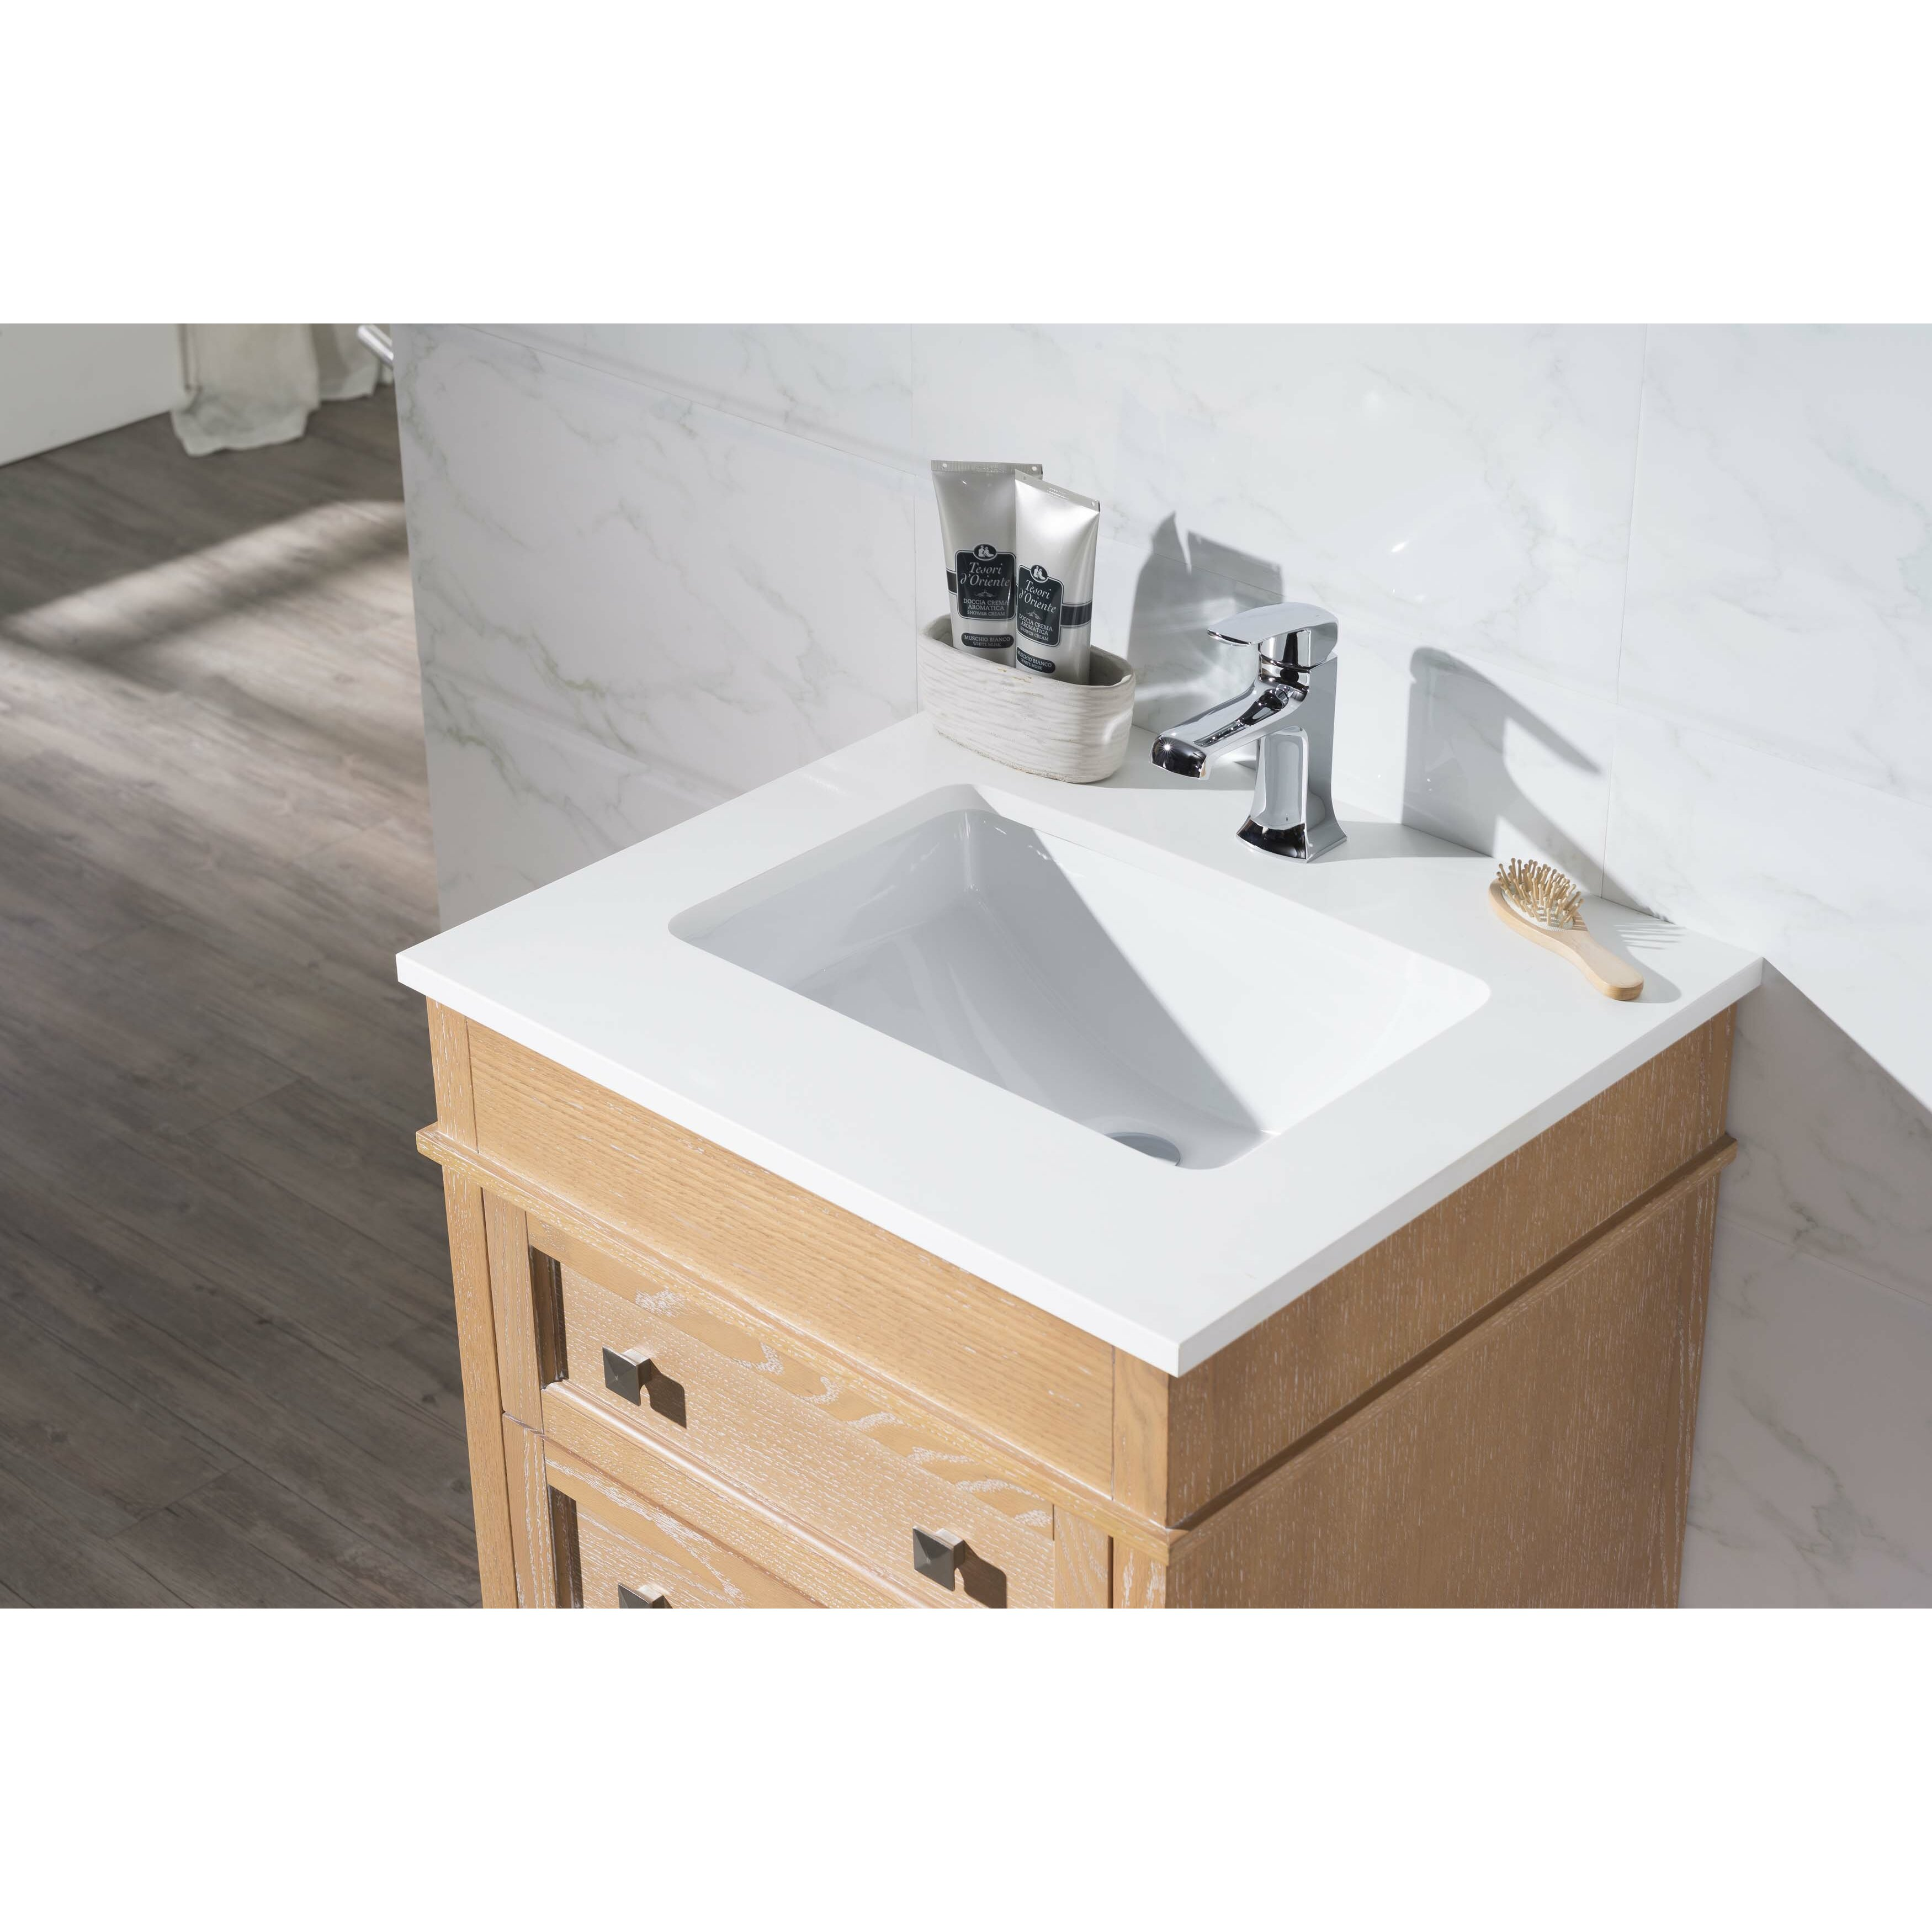 Set Tub Sink : Norwood 25